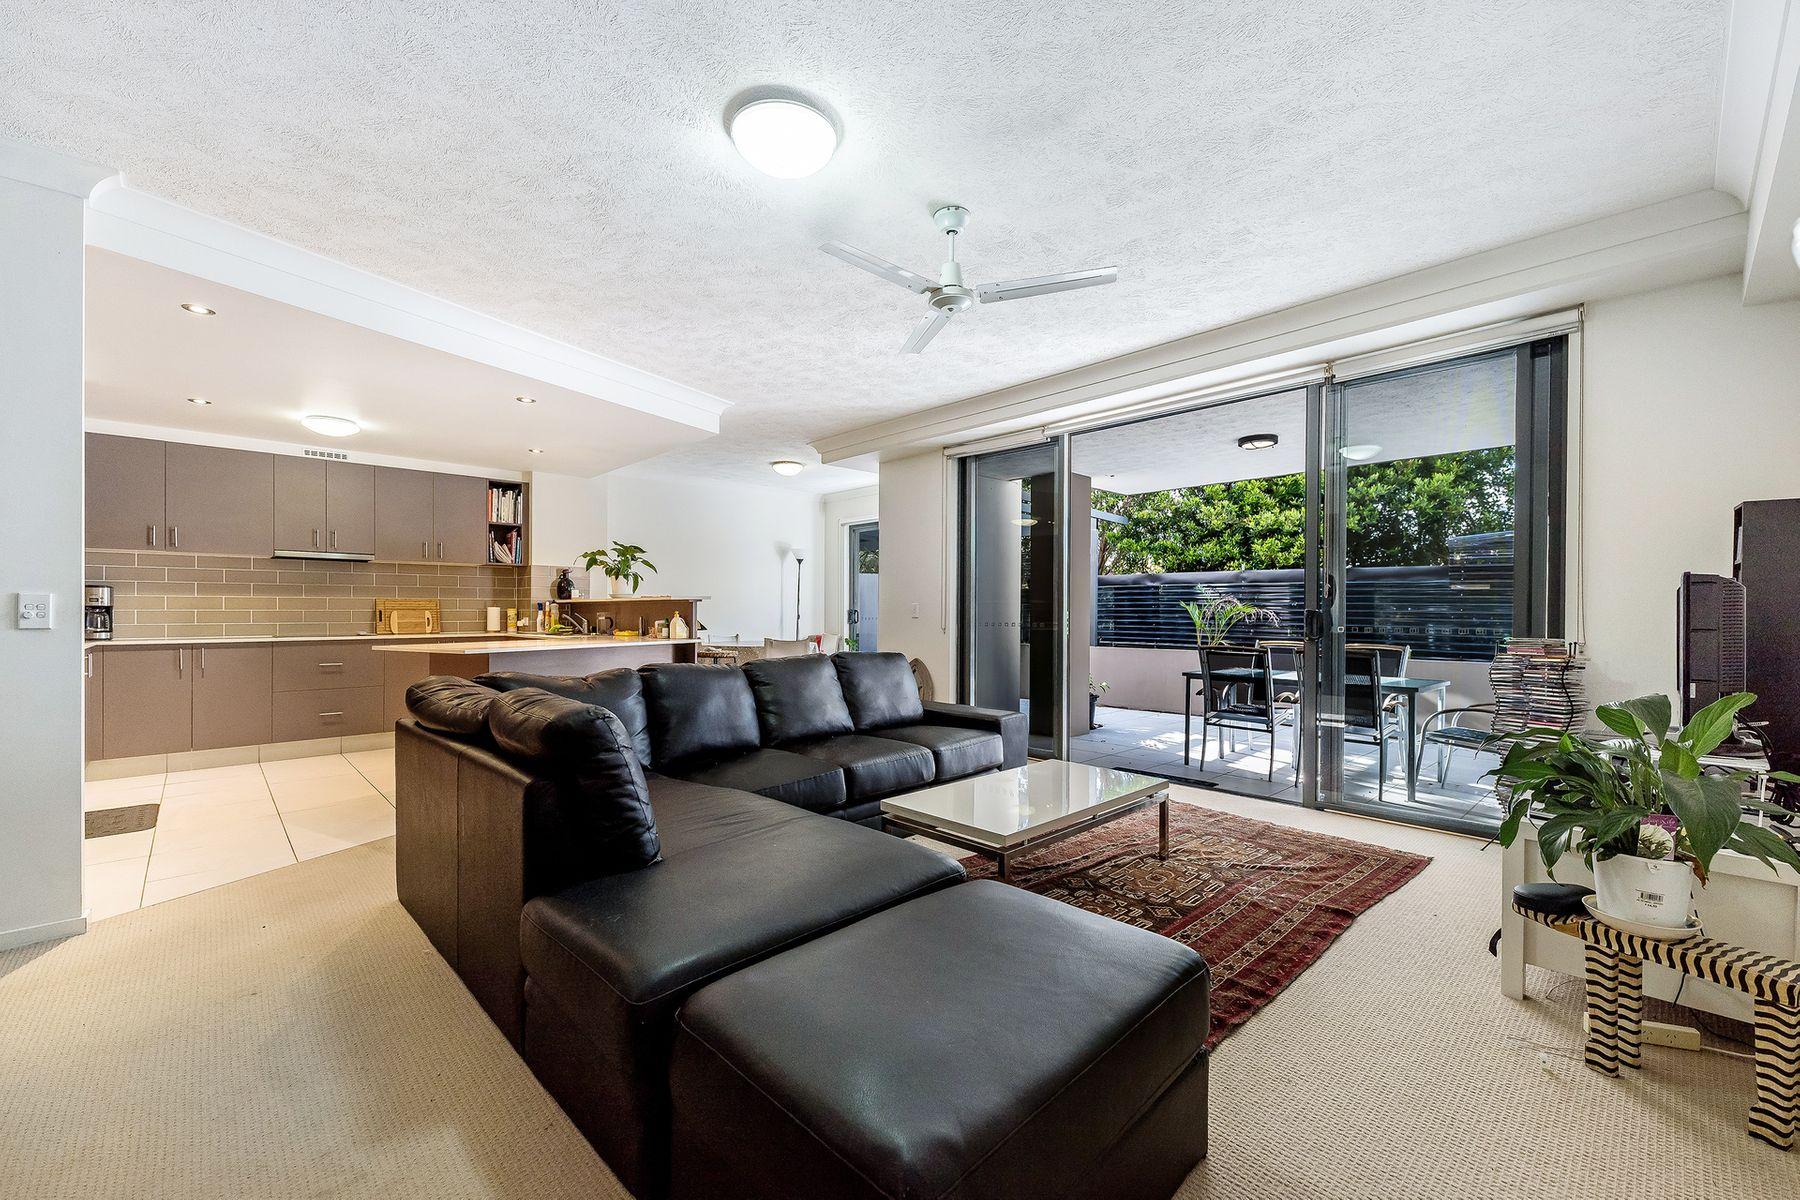 10/1 Acacia Court, Robina, QLD 4226